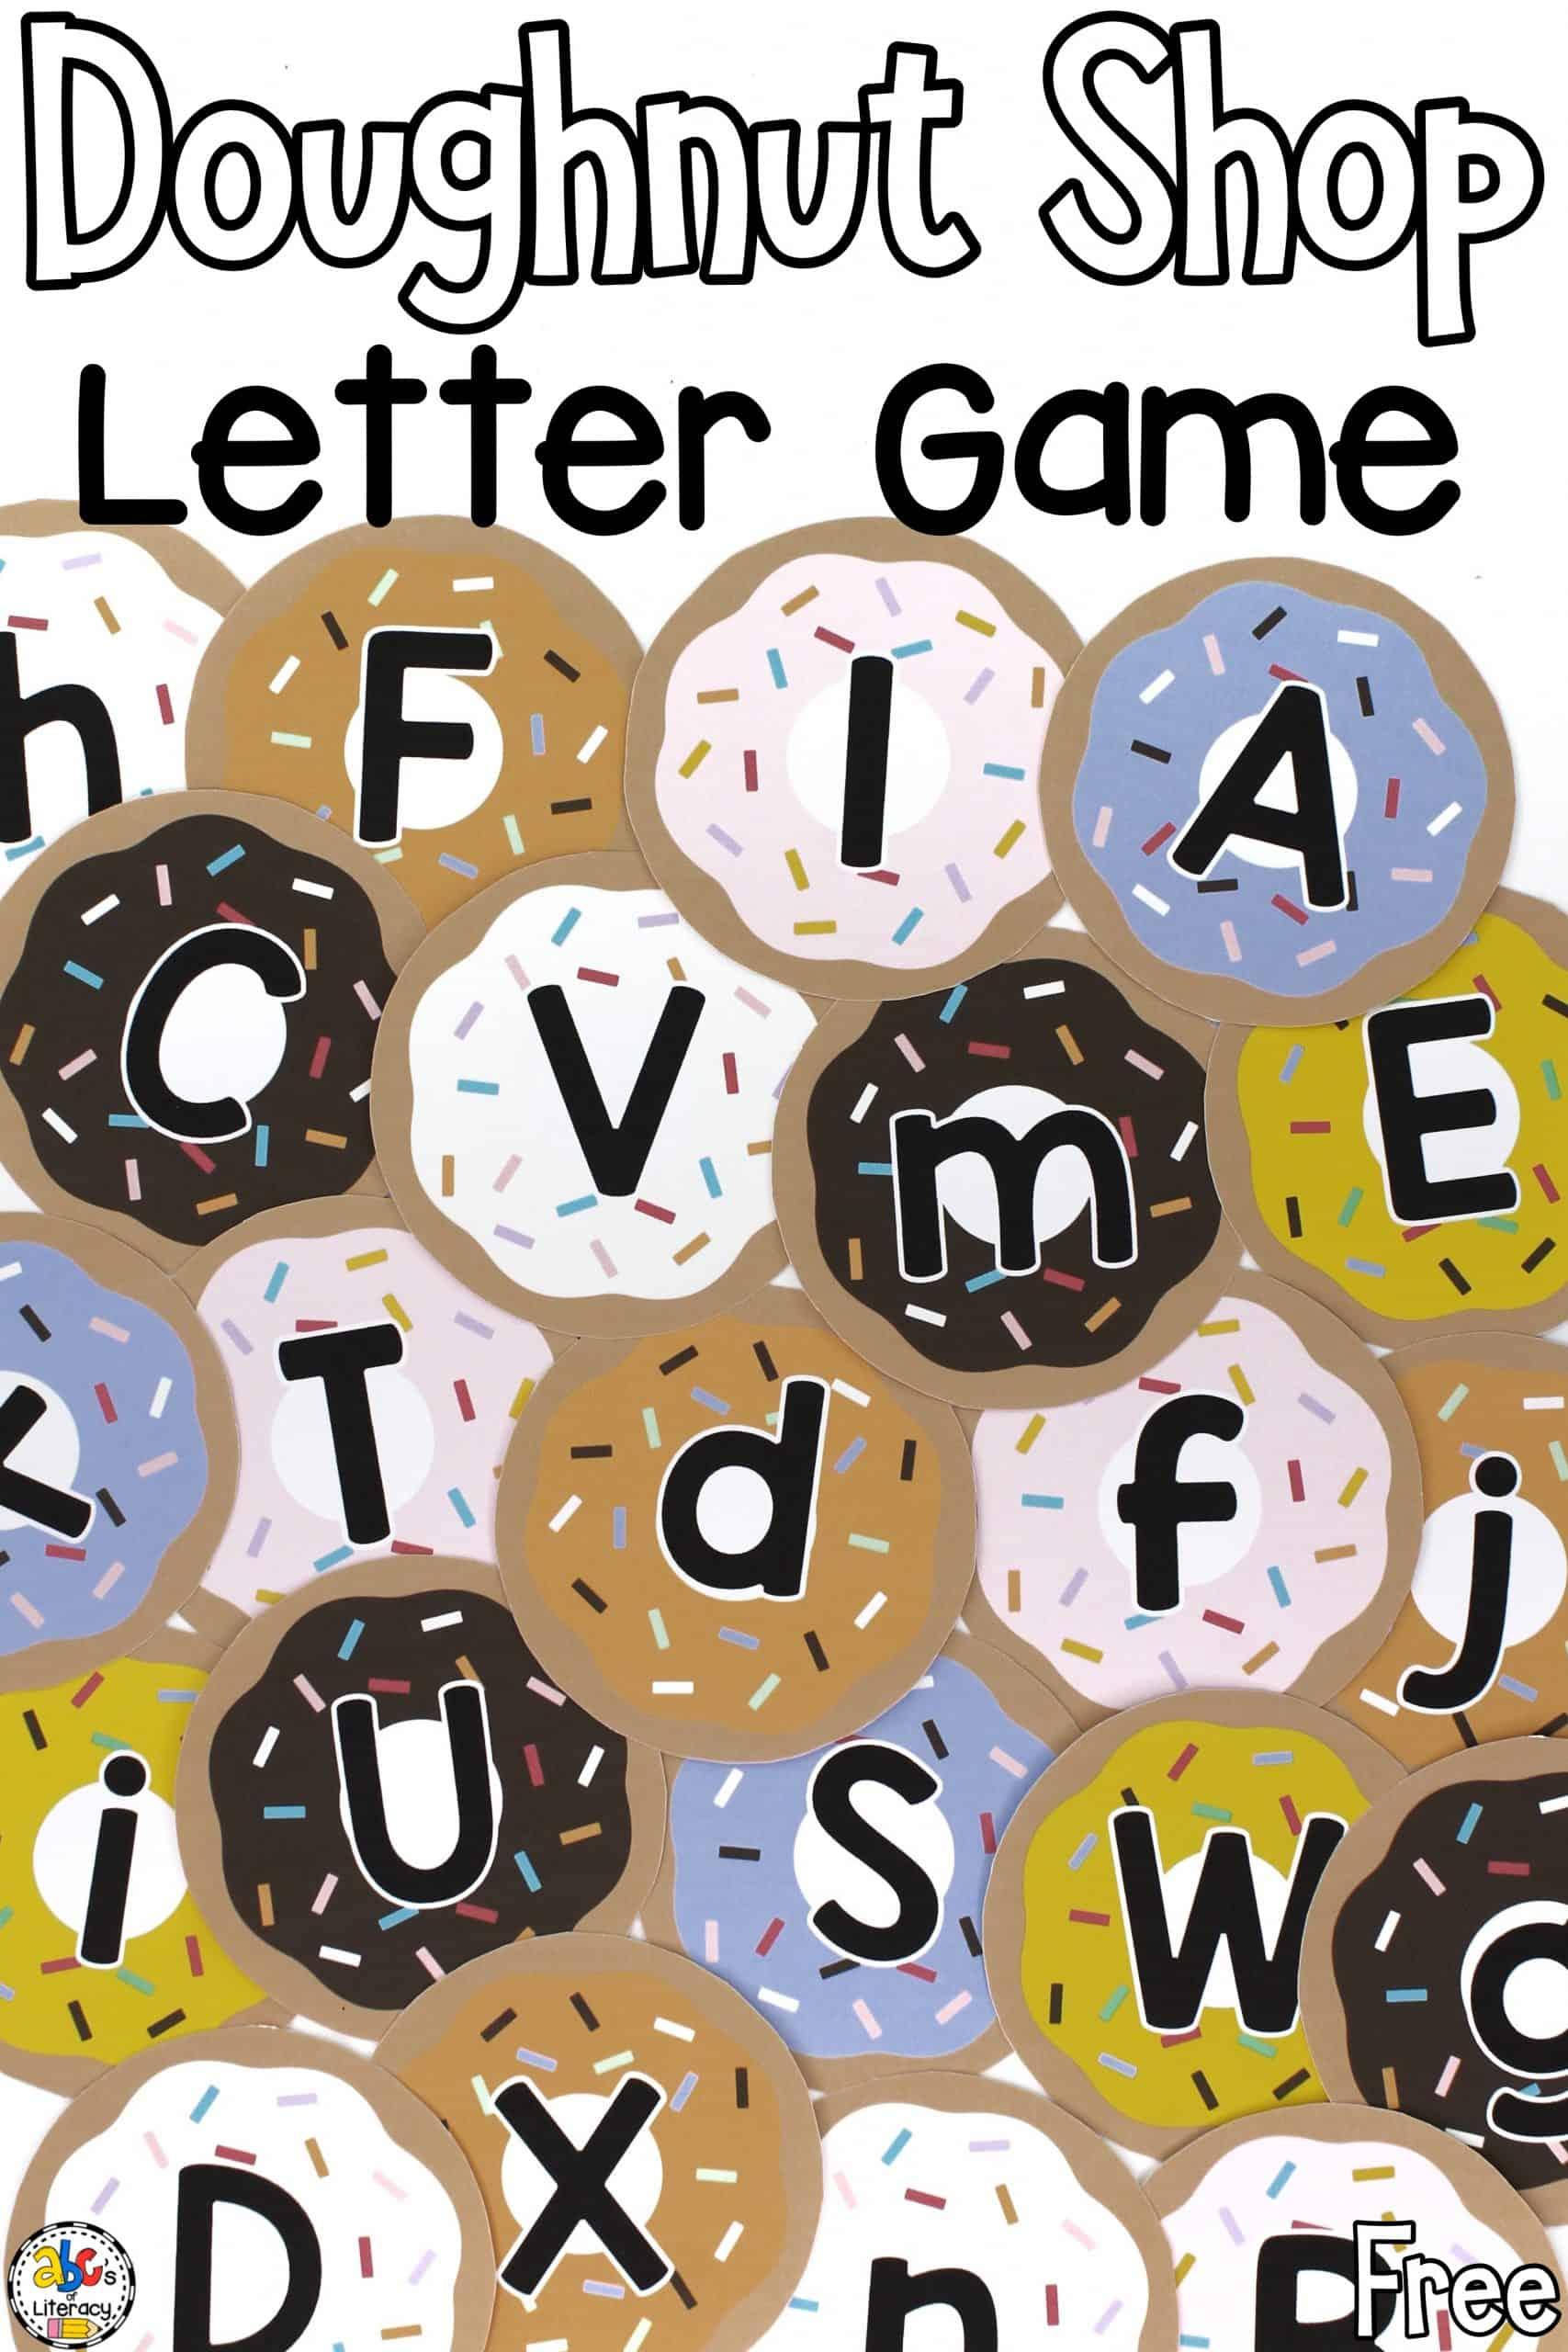 Doughnut Shop Letter Game